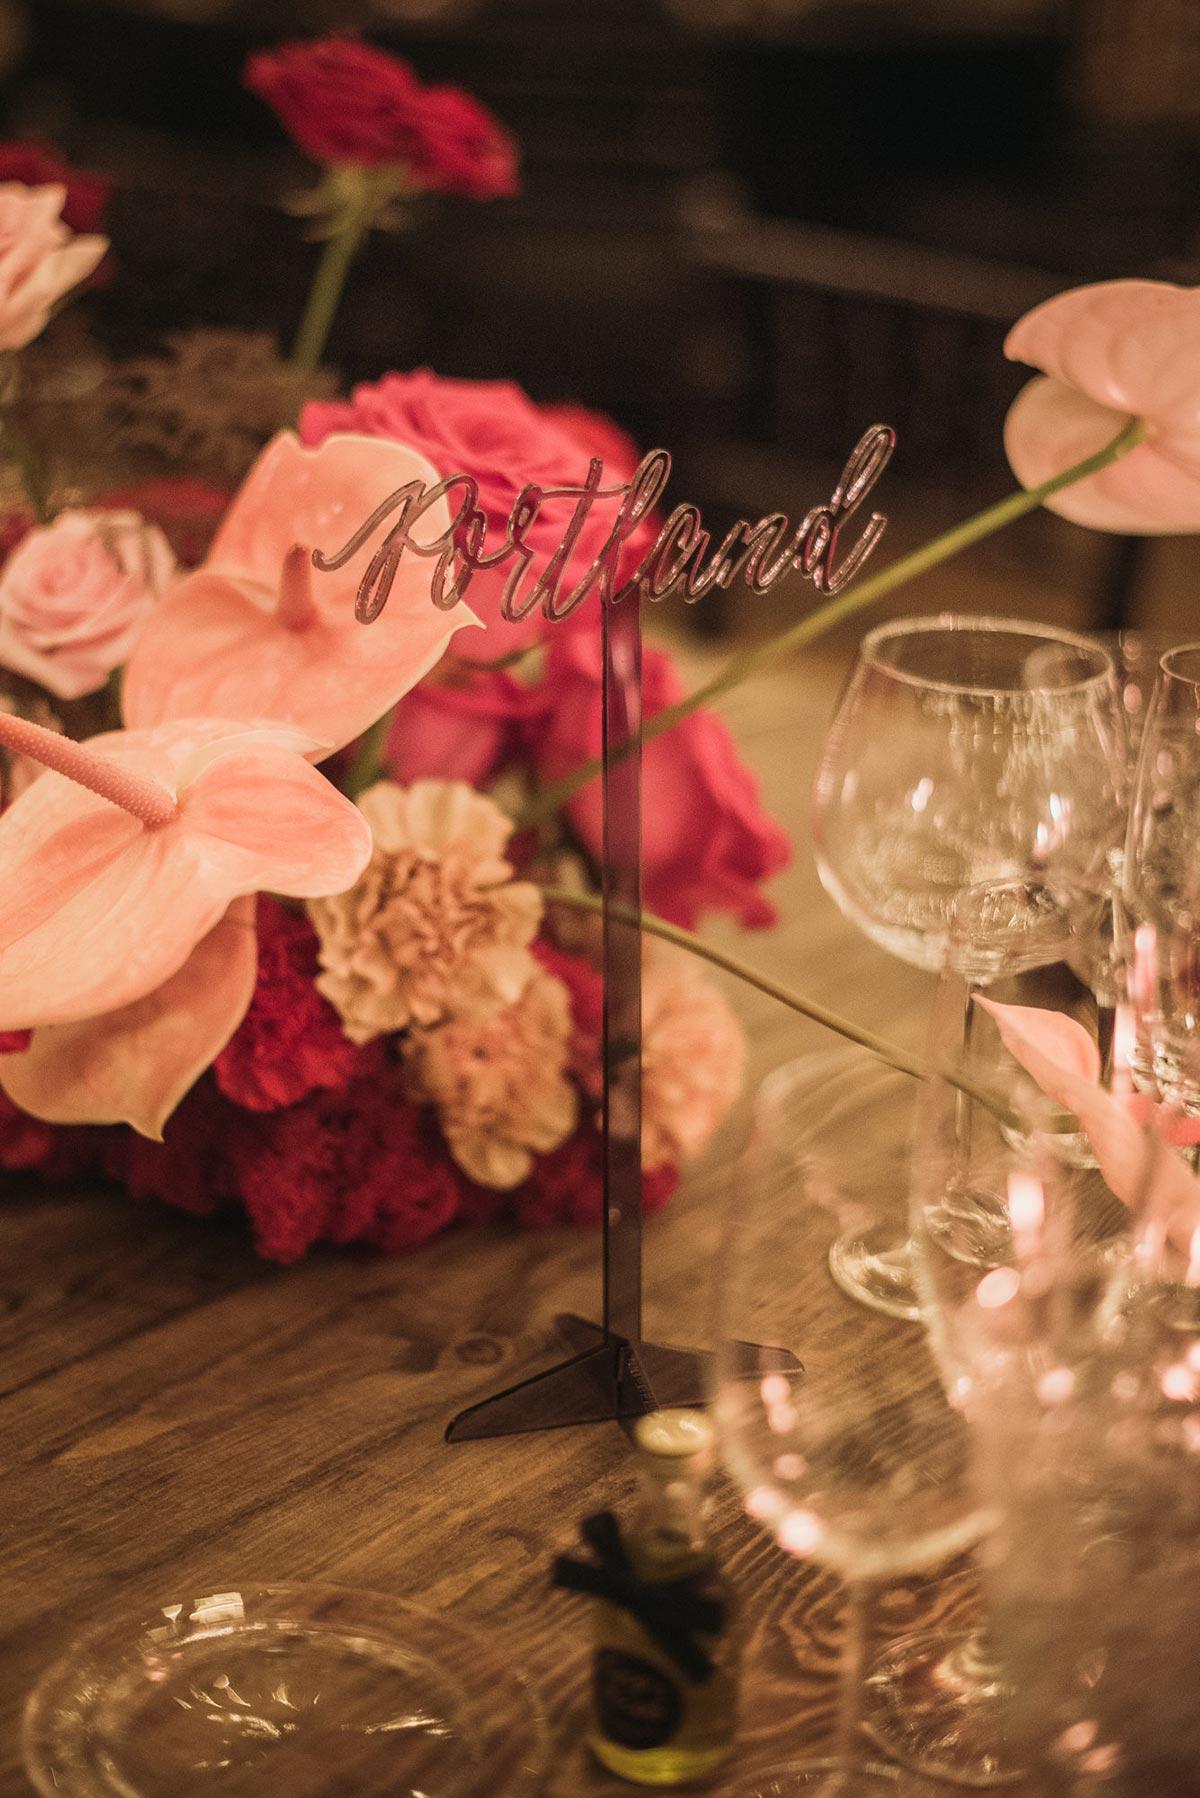 Nombre de mesa Boda de noche llena de luces | iluminacion | Bodas de Cuento